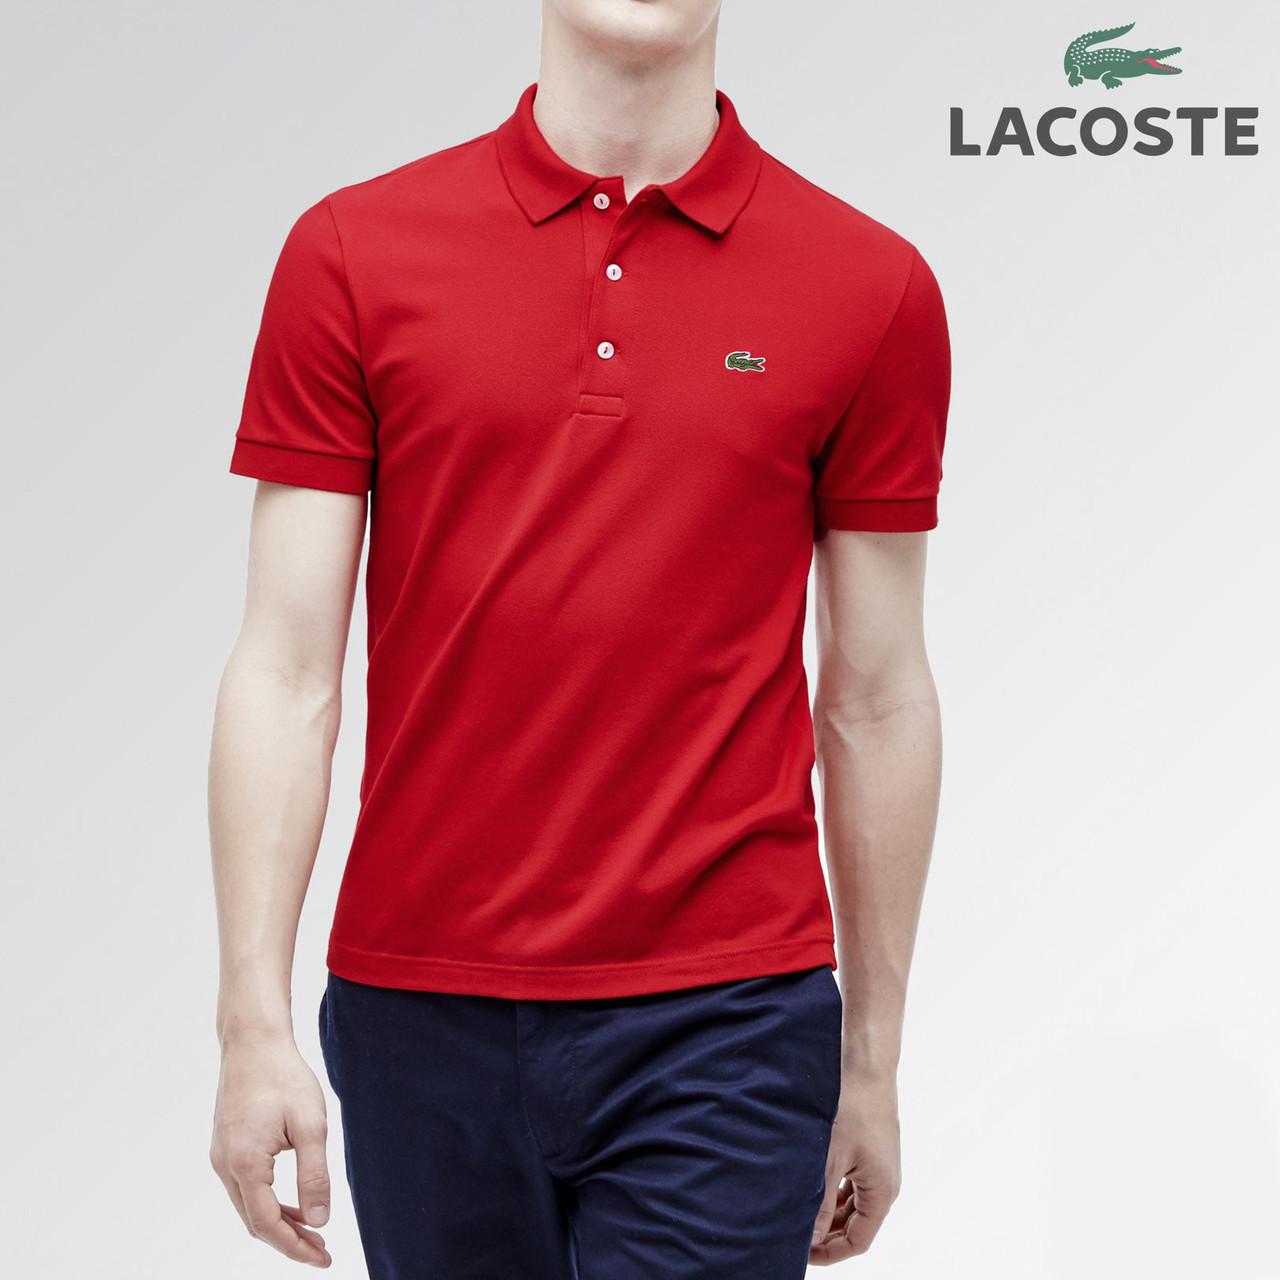 Футболка POLO Lacoste  логотип вышивка красный реплика , фото 1